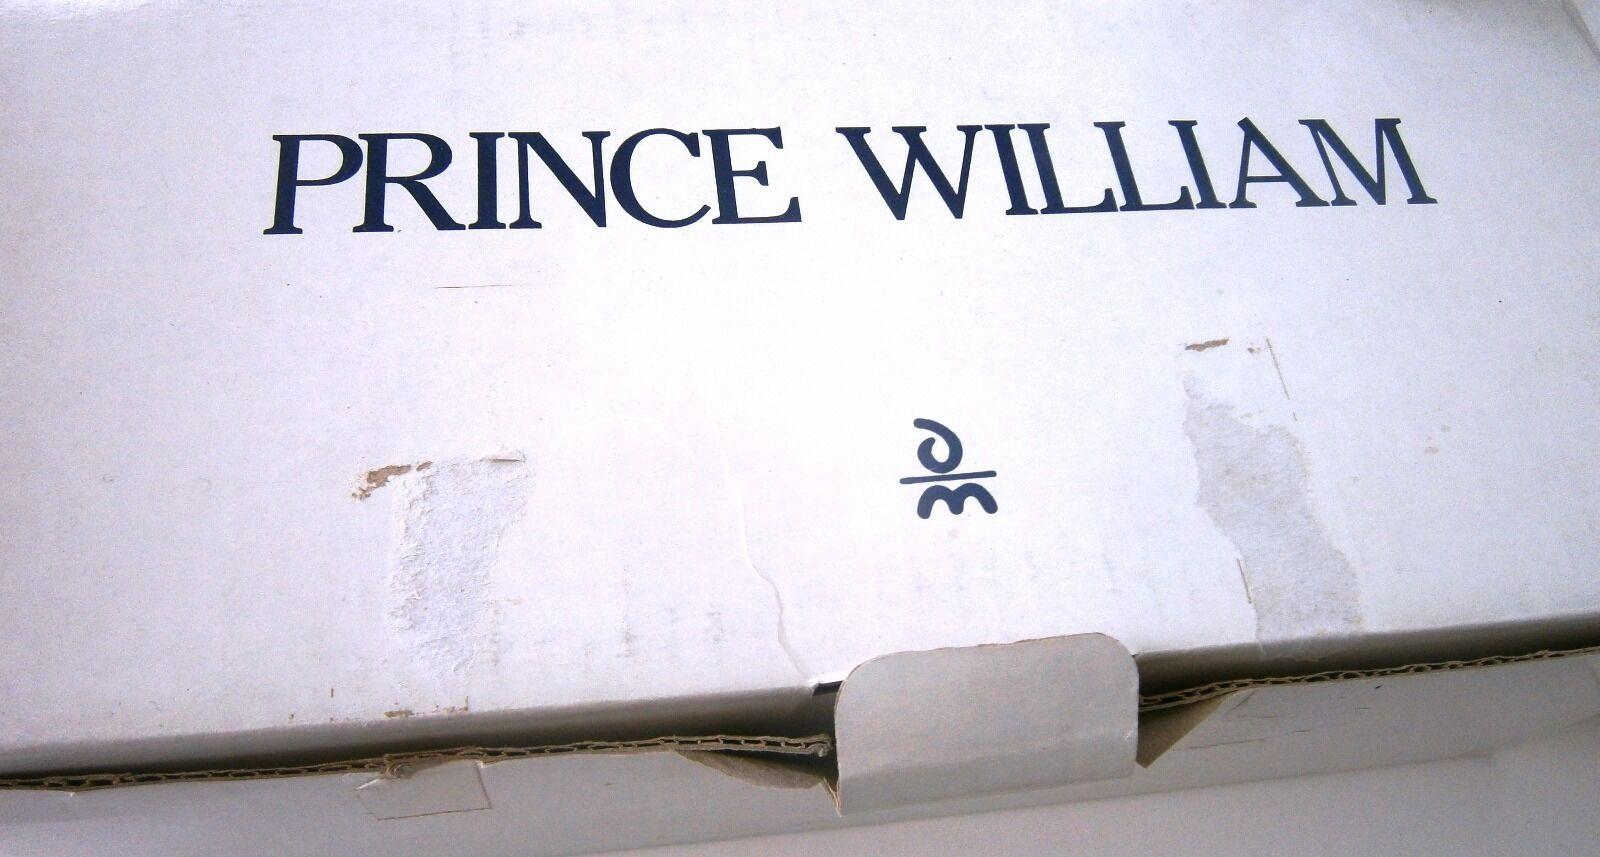 Prince William The Royal Wedding Doll by Danbury Mint image 4